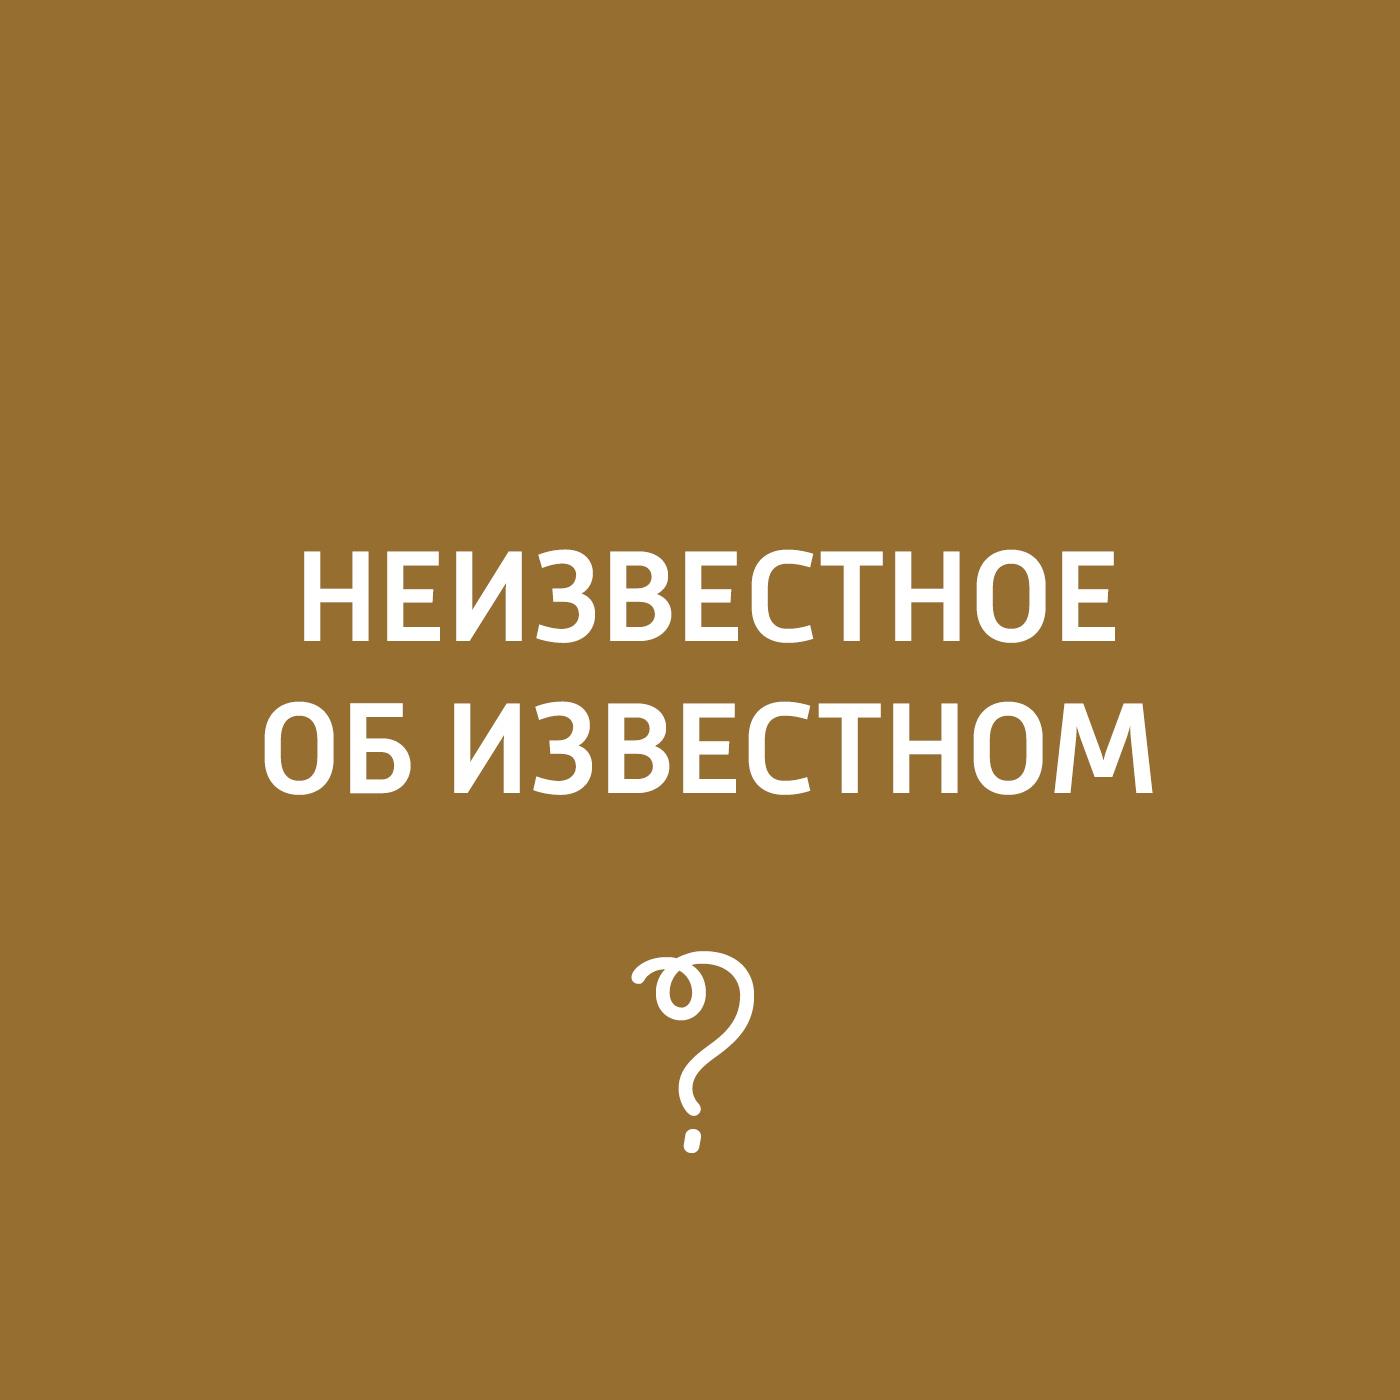 Марк Шагал. Накануне дня рождения